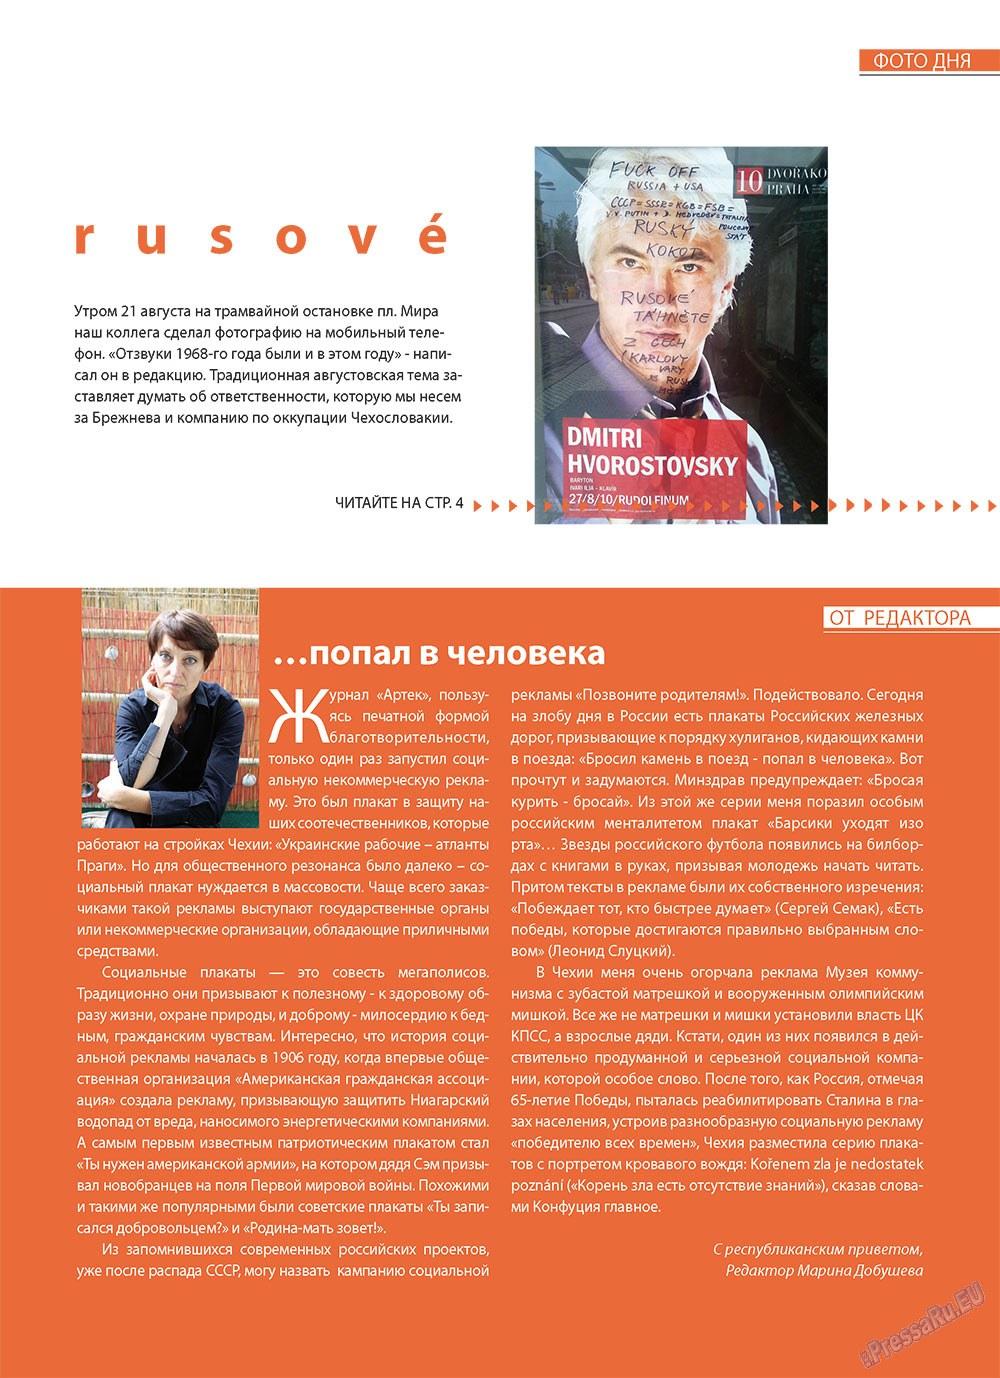 Артек (журнал). 2010 год, номер 4, стр. 3